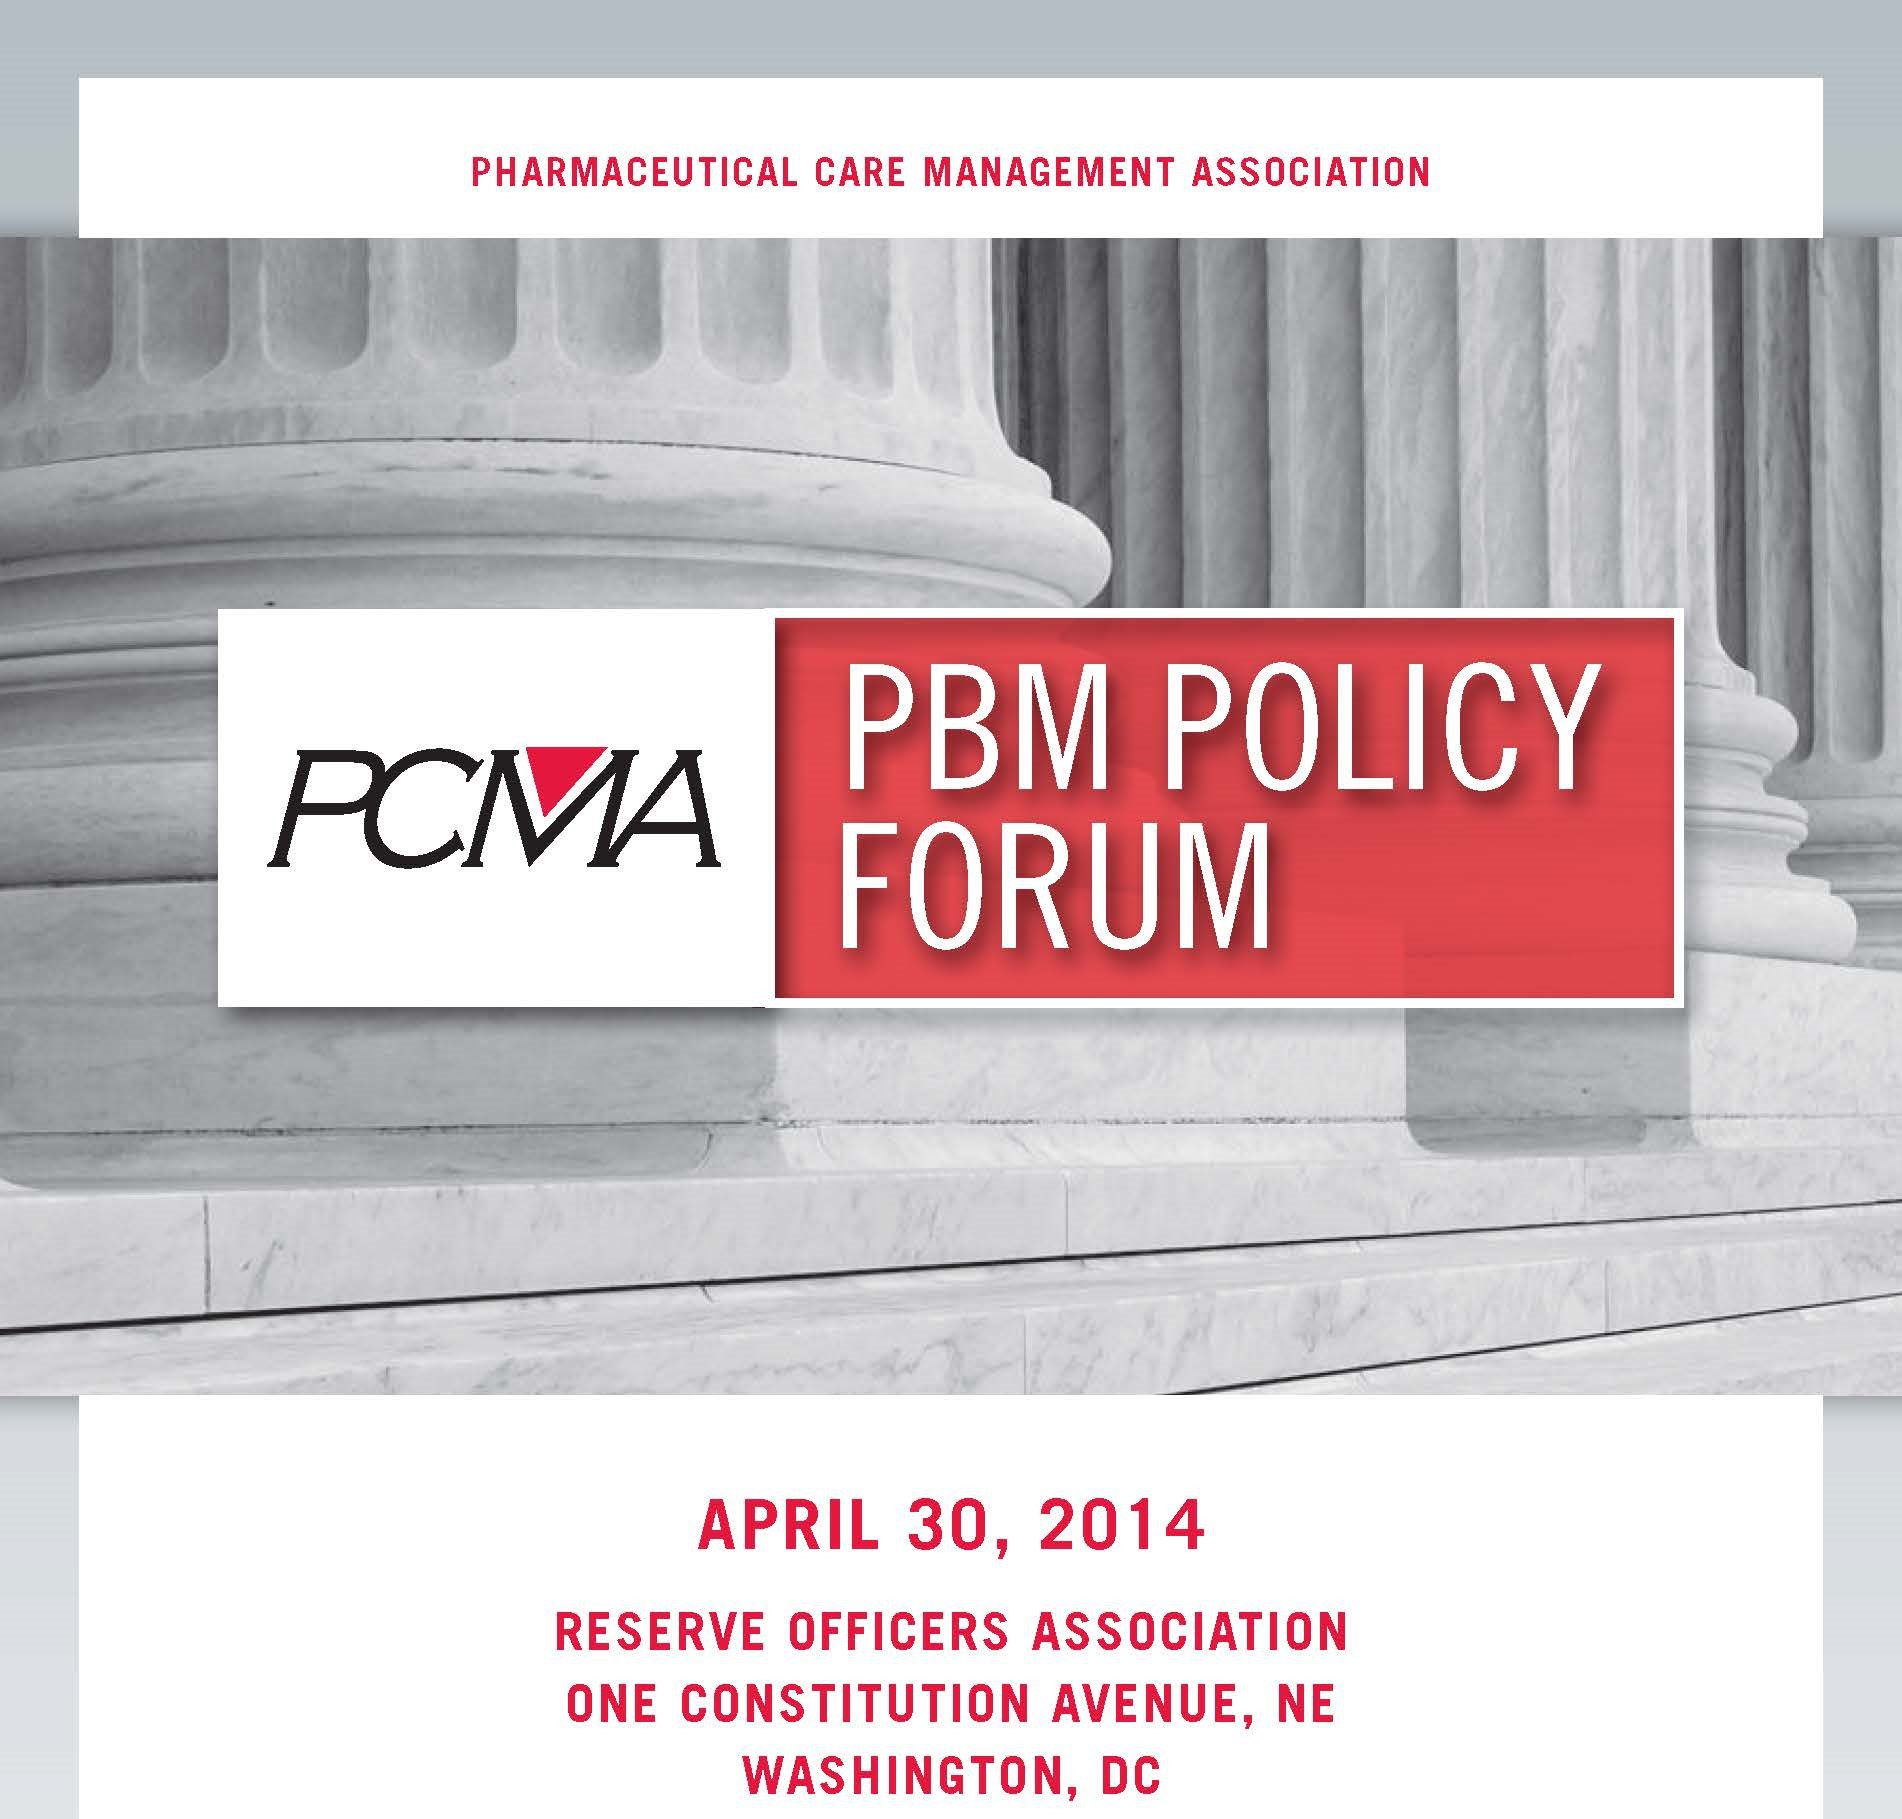 2014_PCMA PBM Policy Forum_Program Book